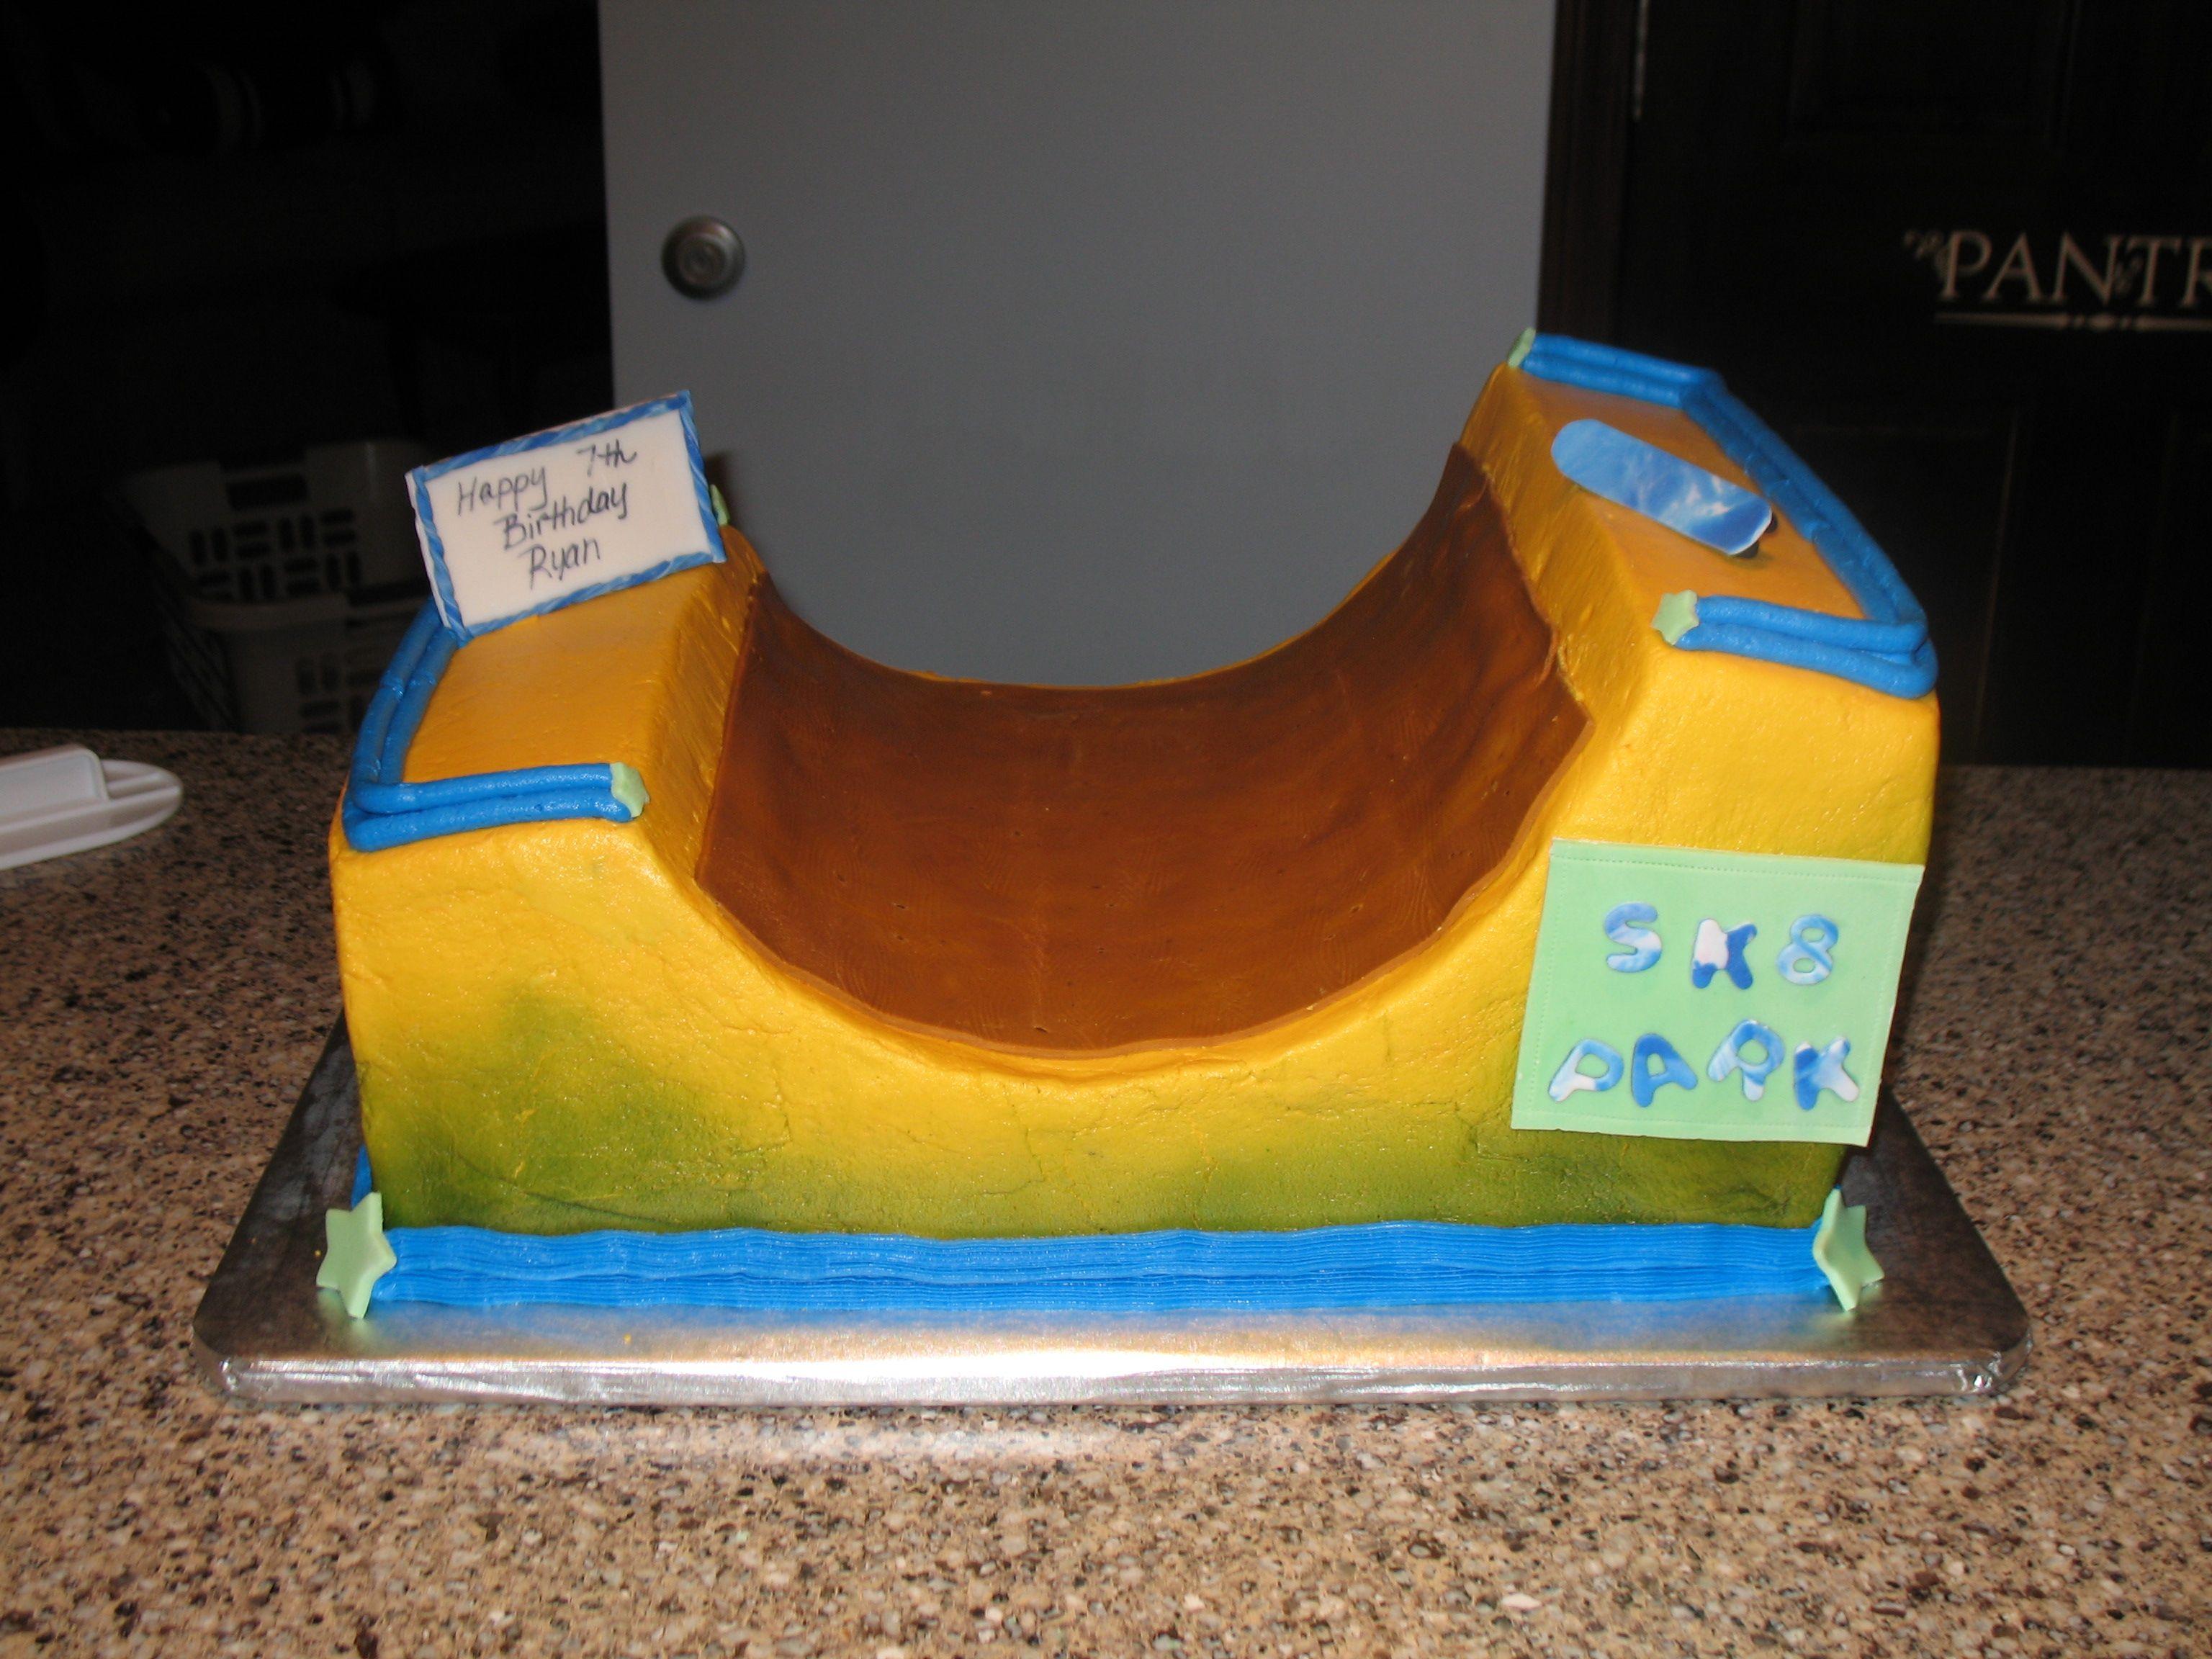 skate park cakes